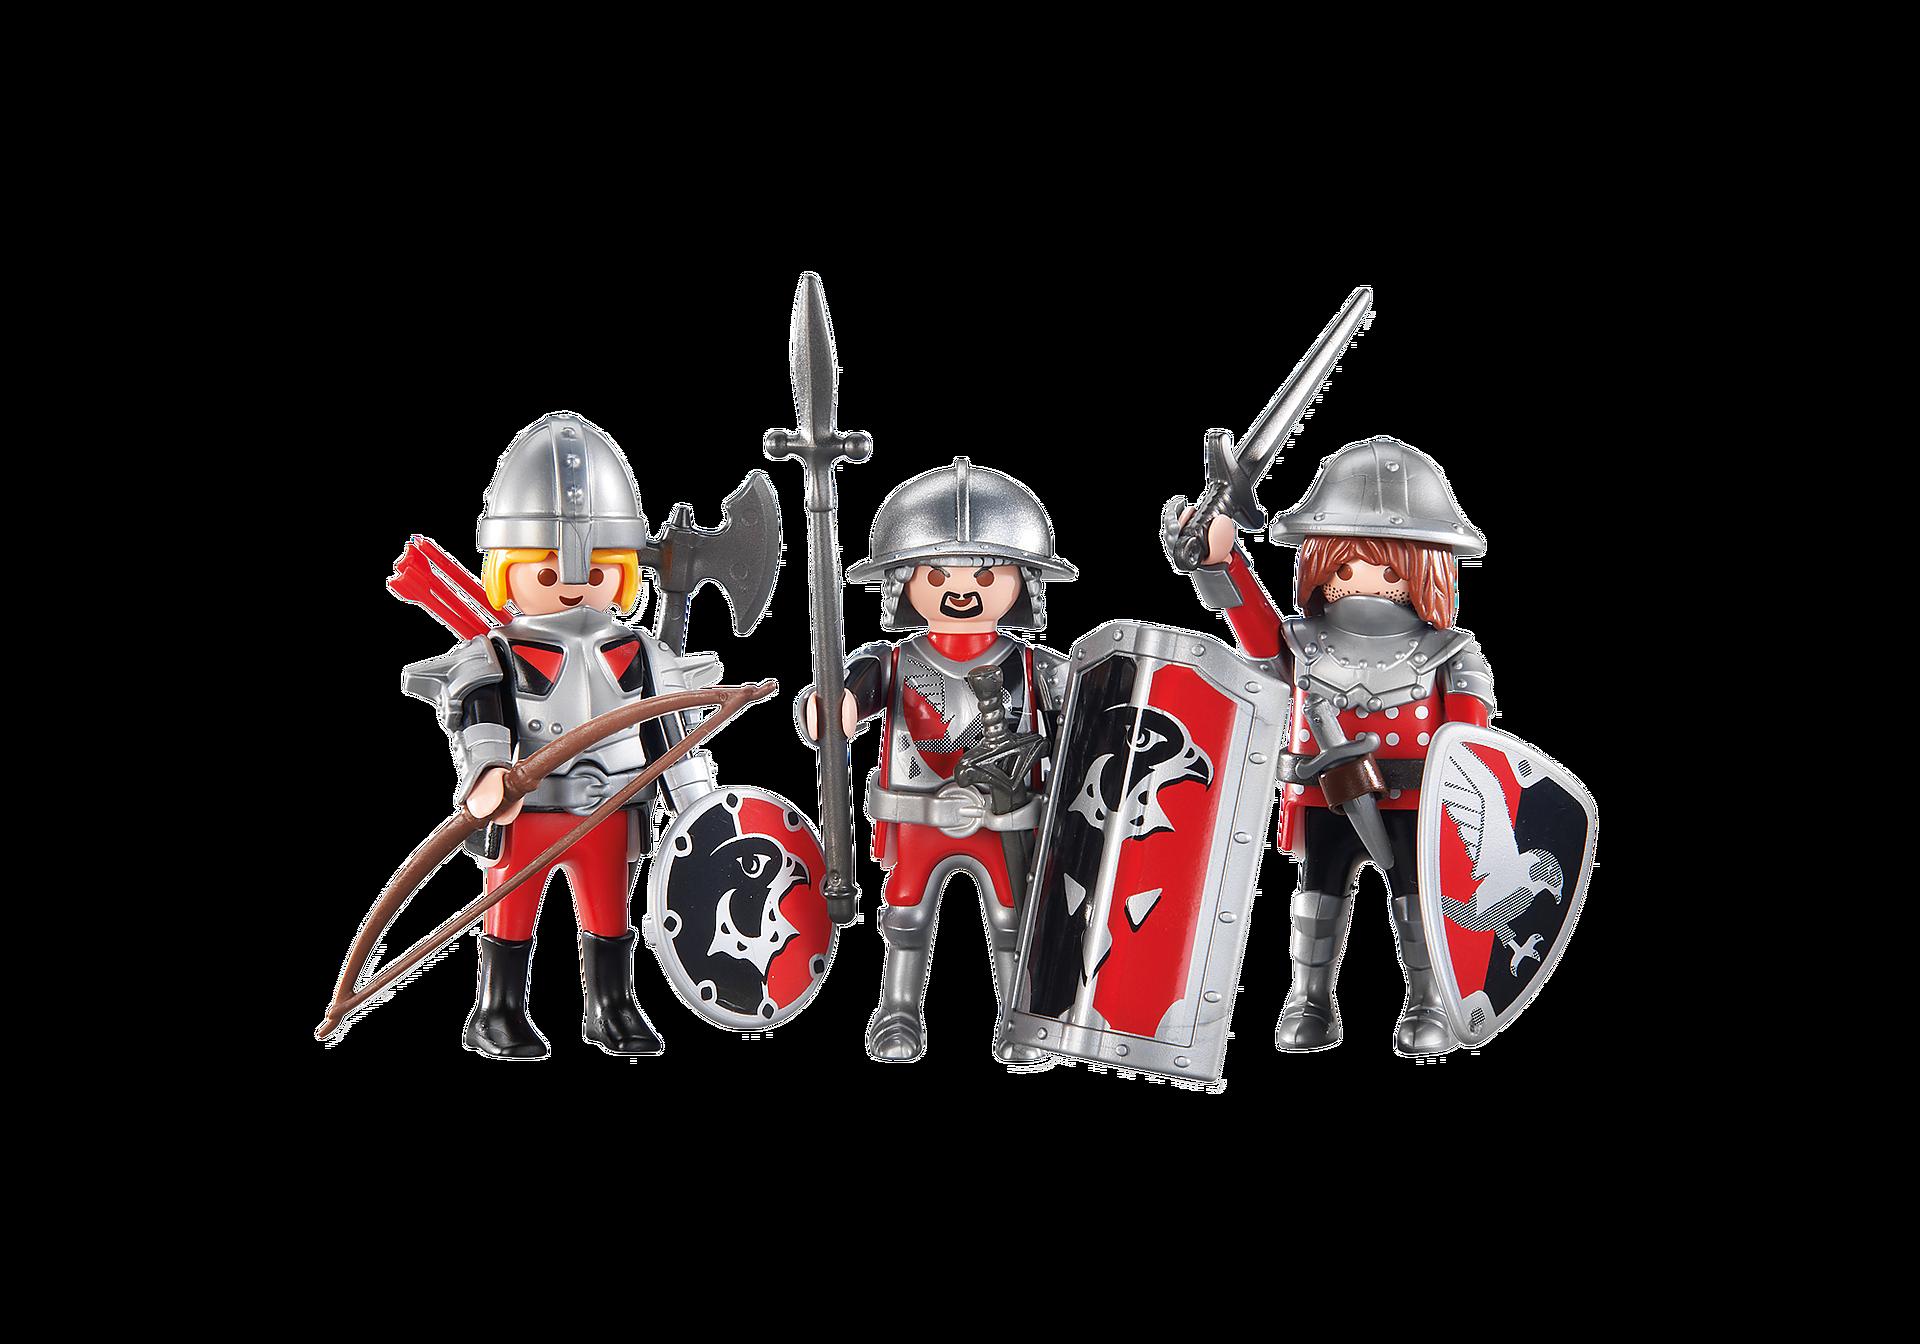 http://media.playmobil.com/i/playmobil/6381_product_detail/Τρεις ιππότες του γερακιού